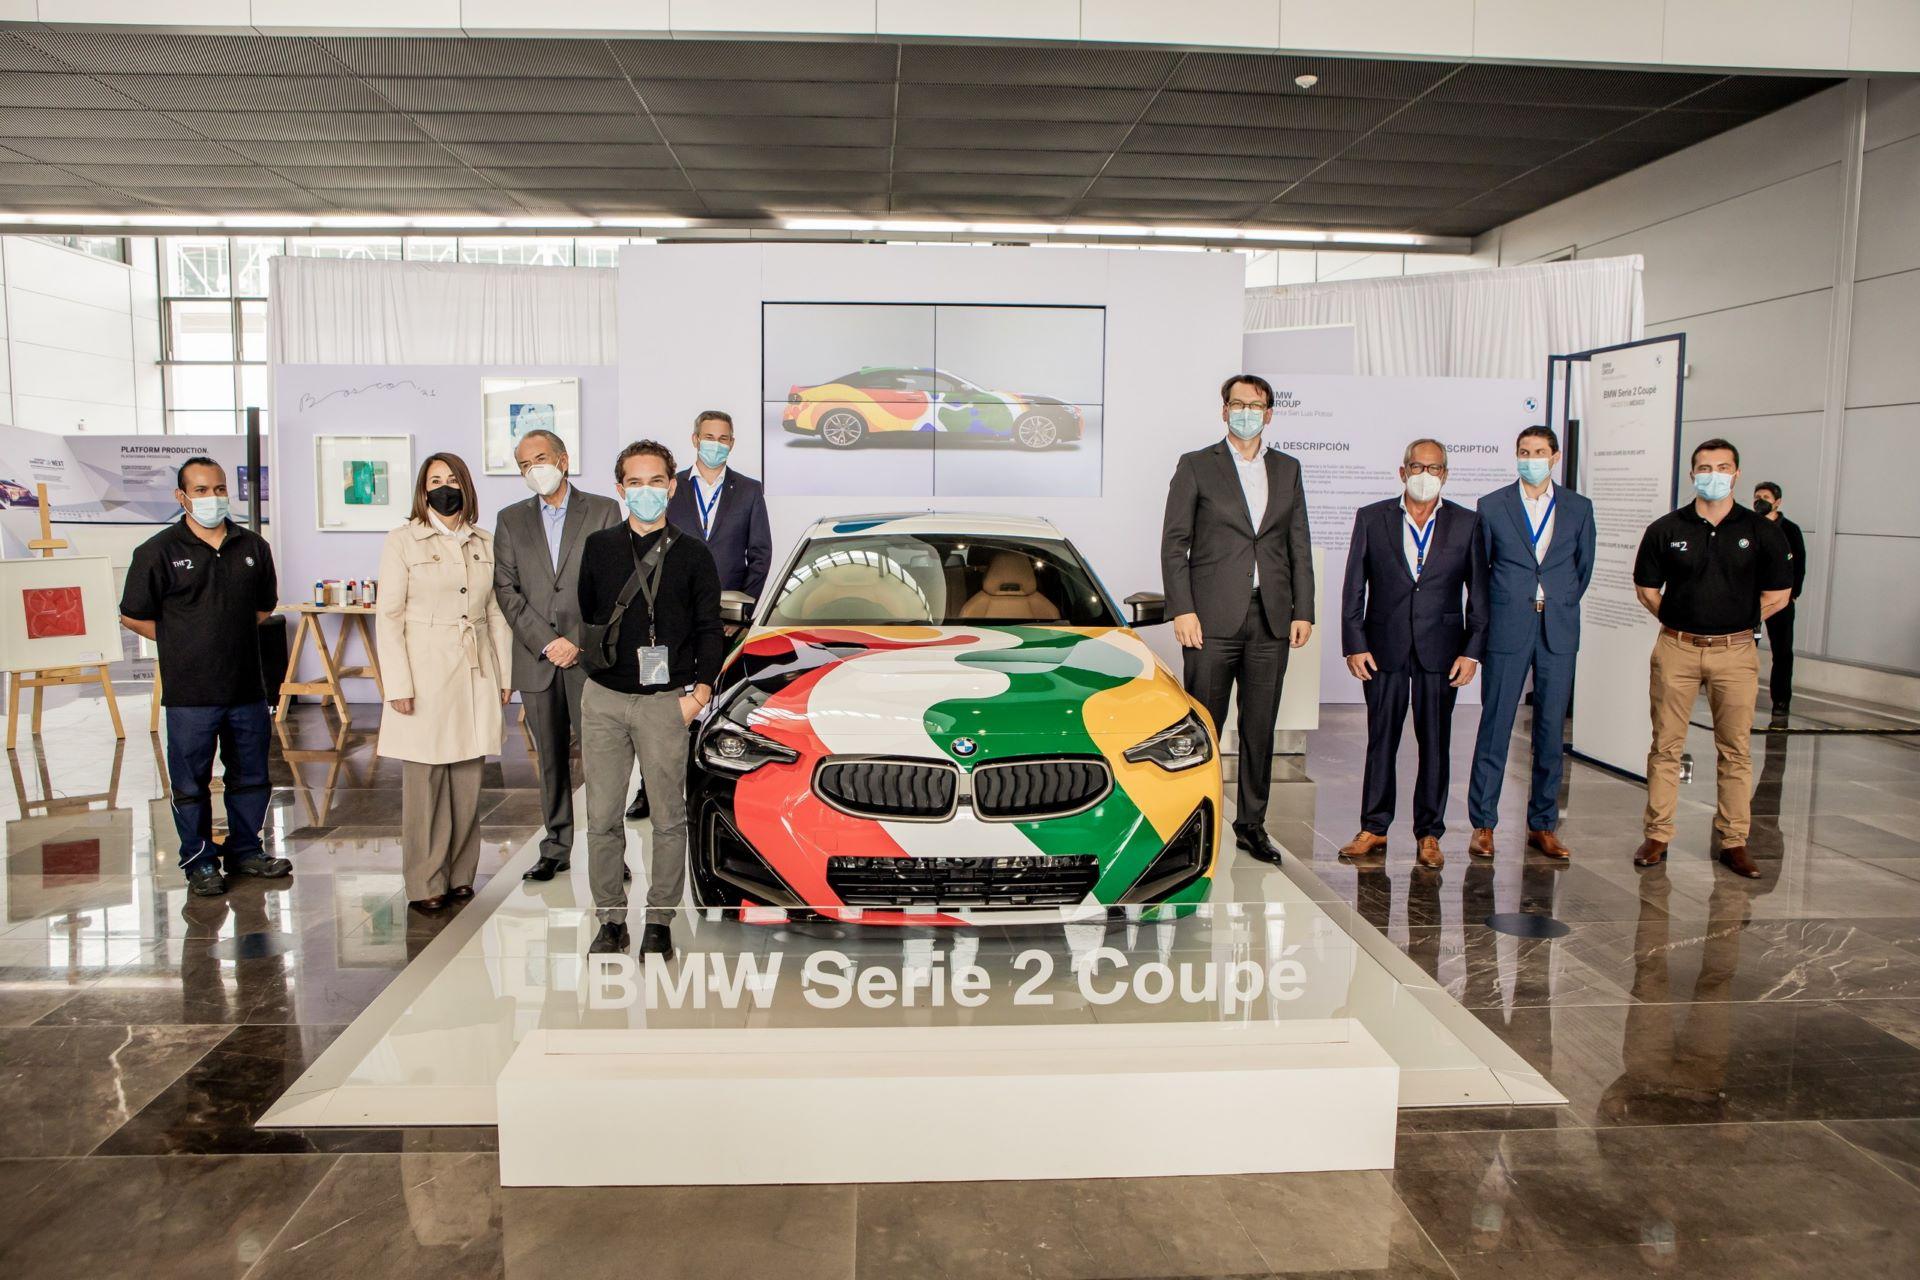 BMW-M240i-2-series-coupe-car-art-2